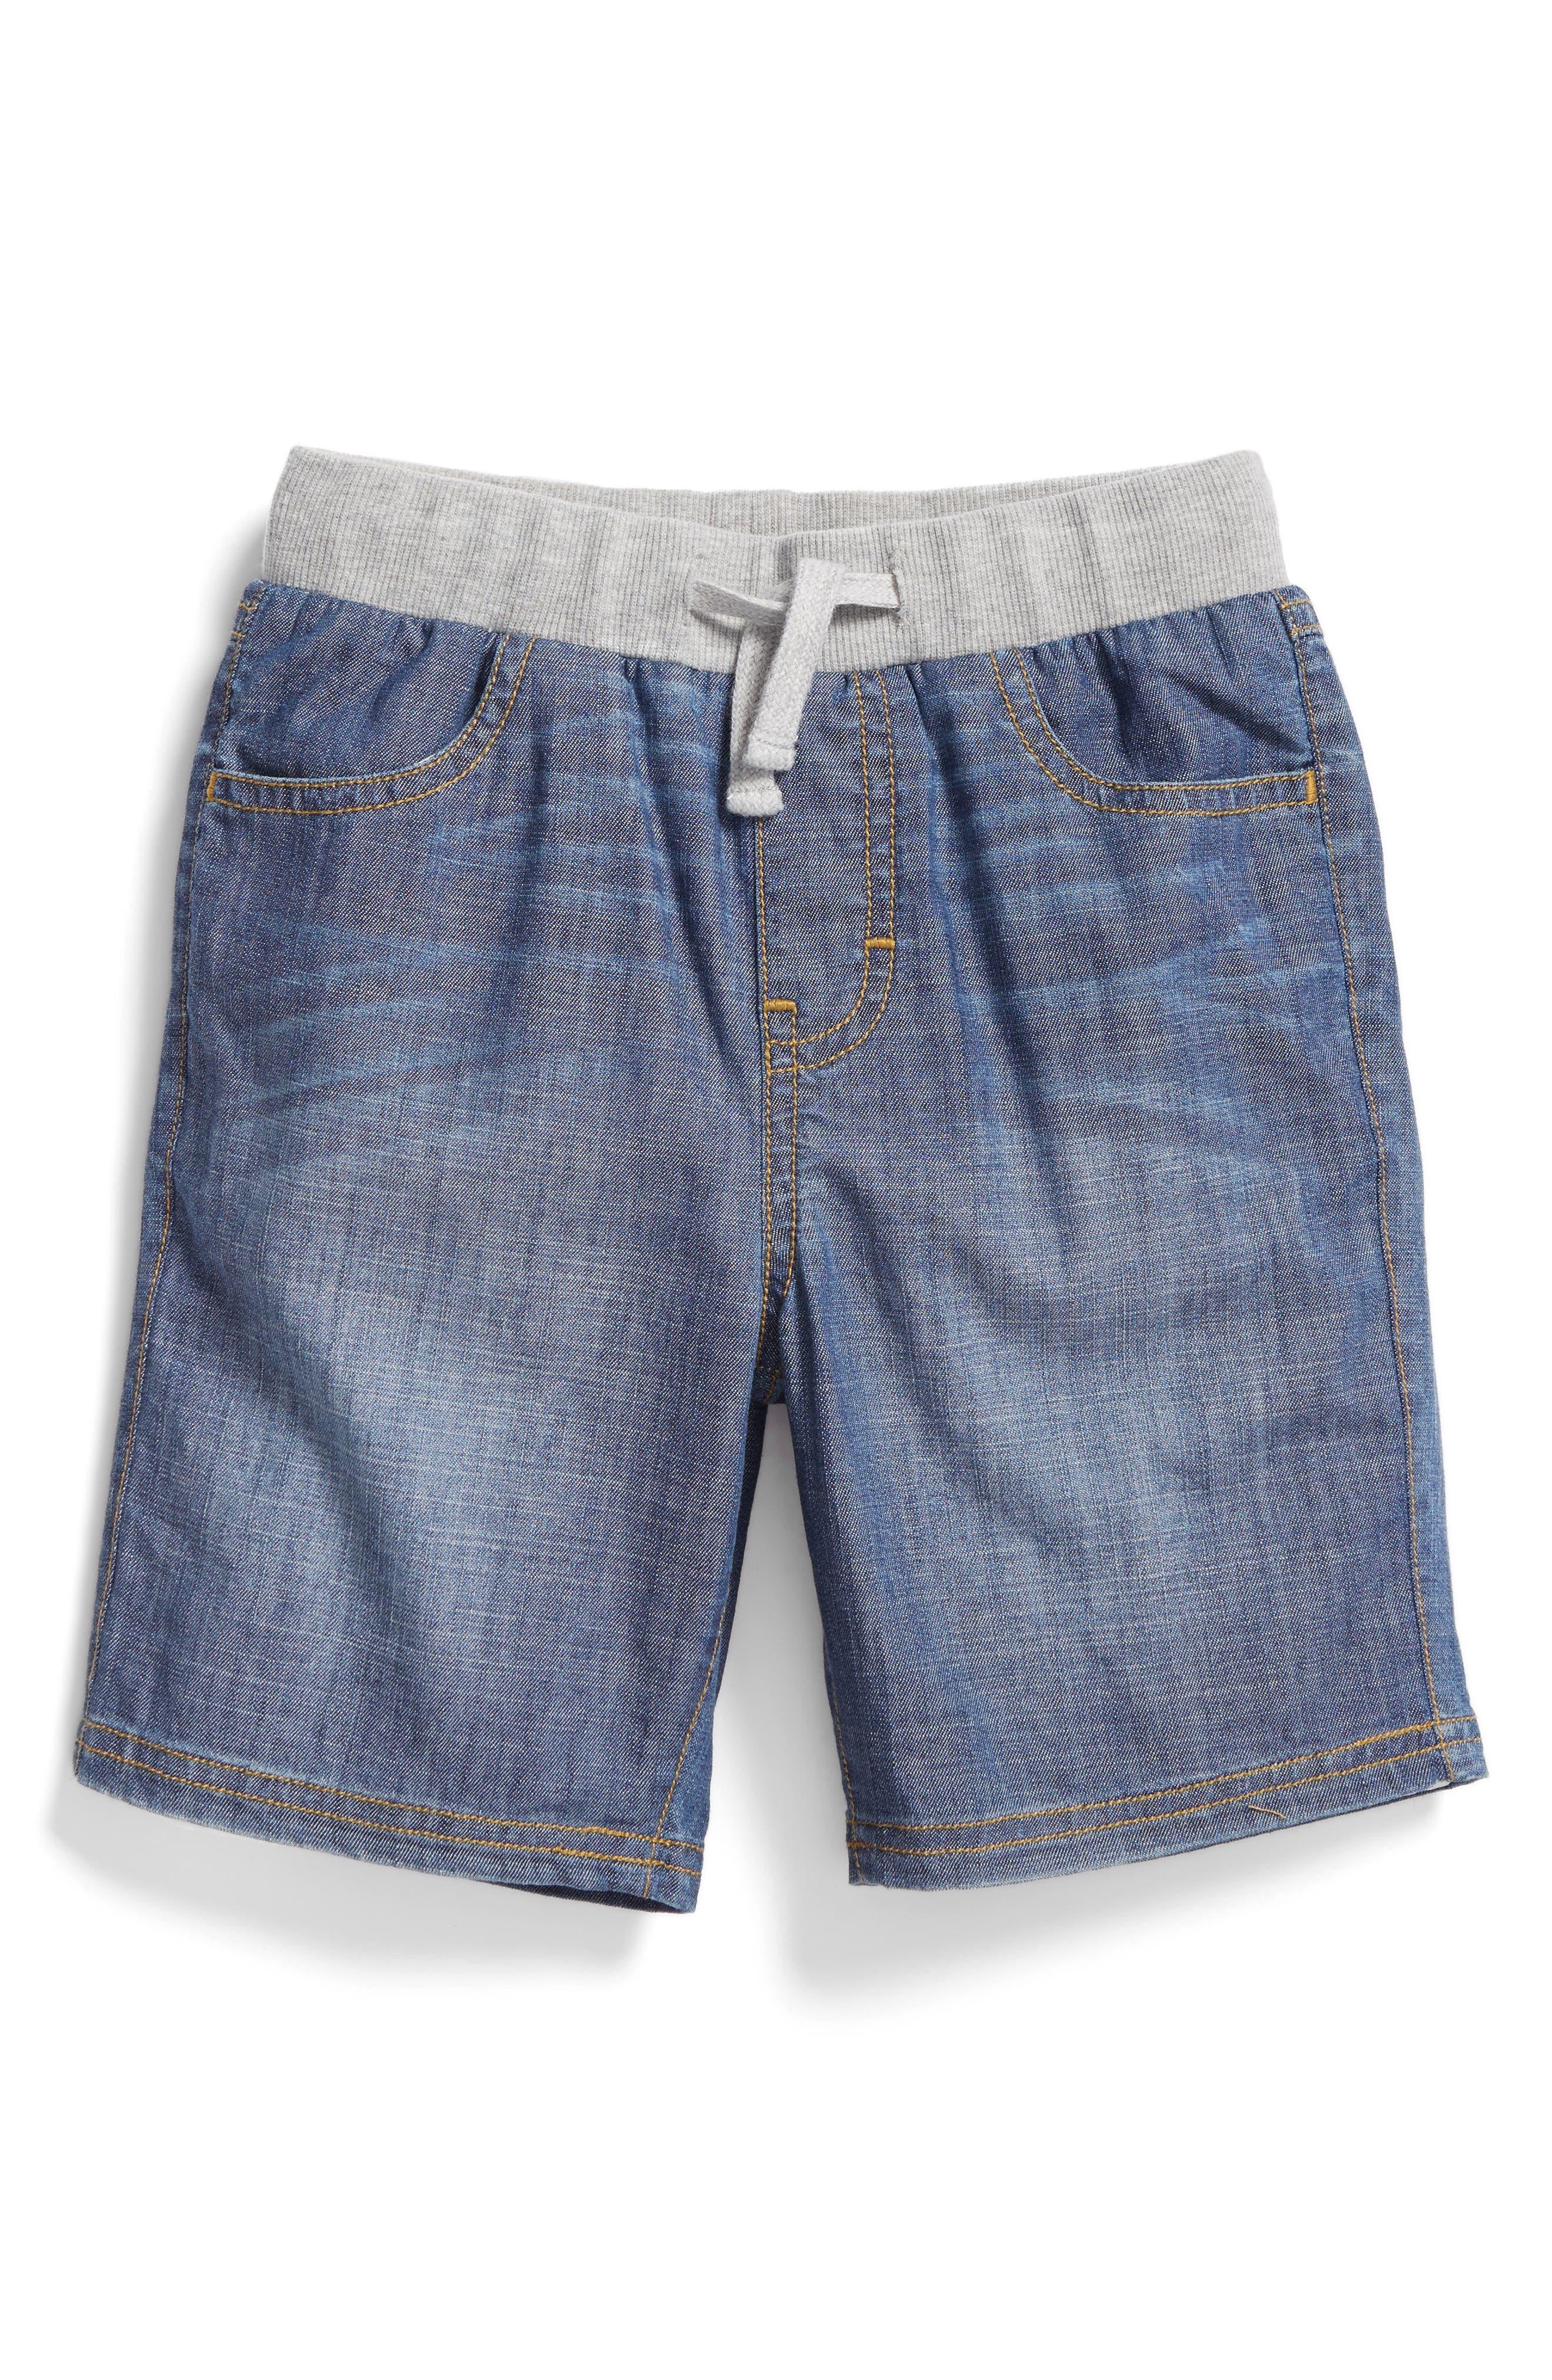 Main Image - Tucker + Tate Denim Shorts (Toddler Boys & Little Boys)